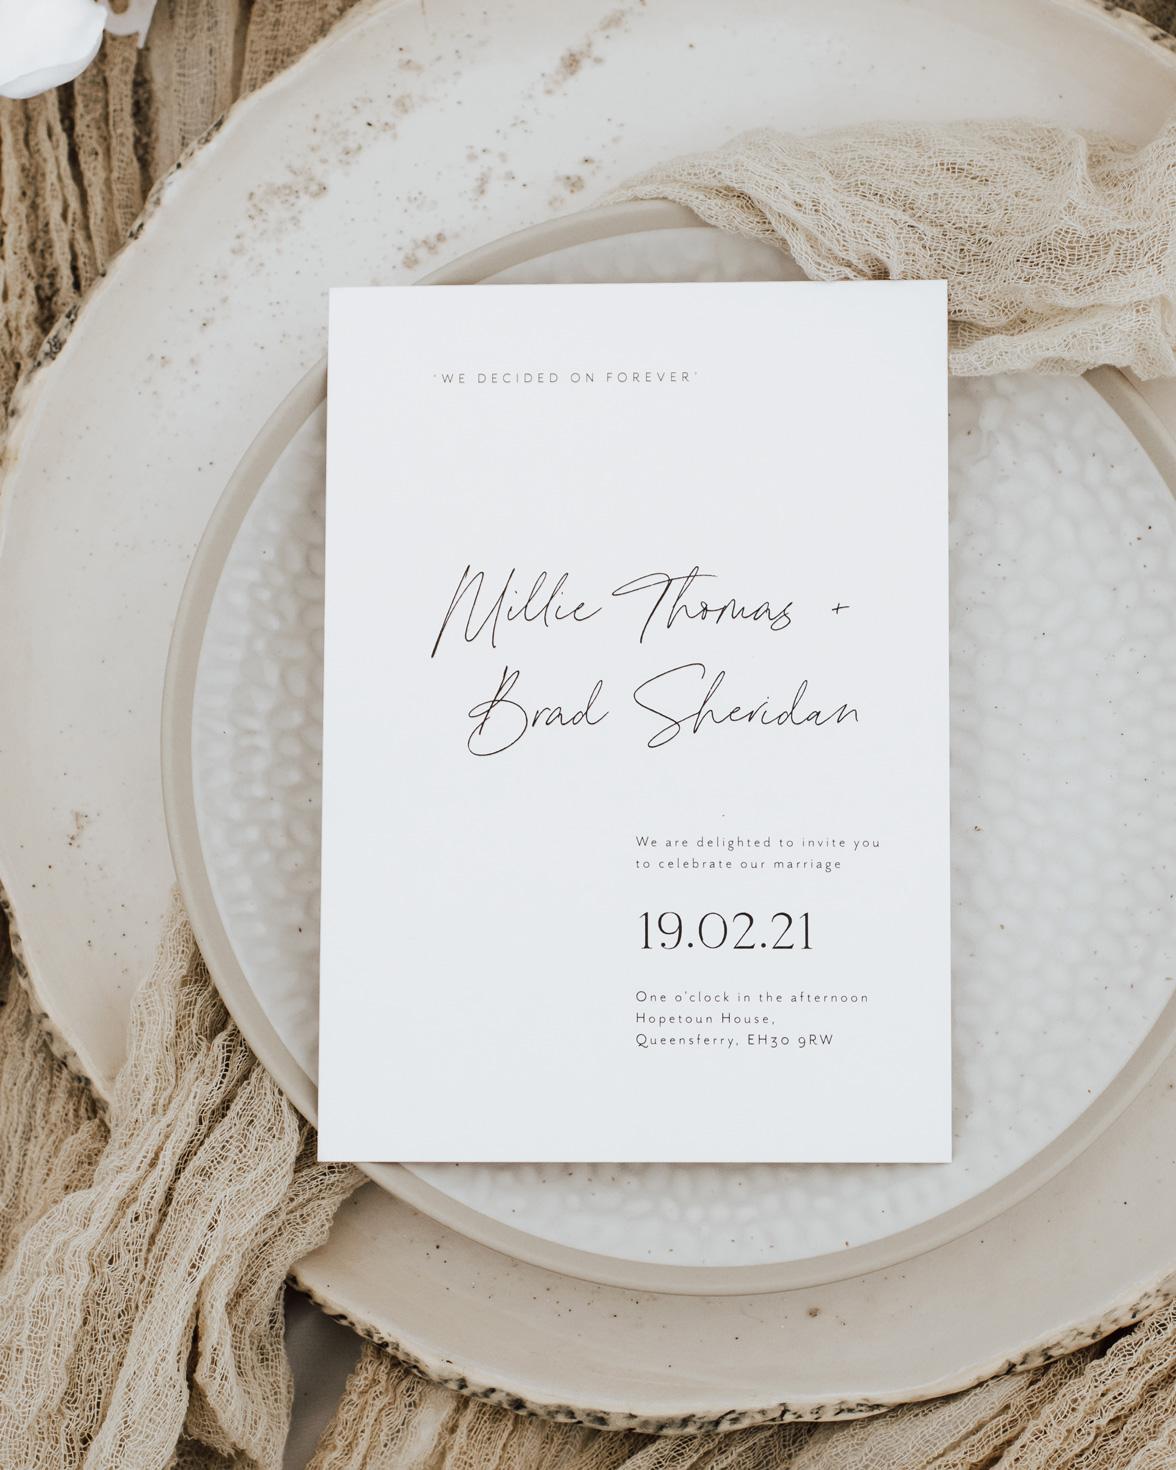 Duly noted wedding invitation